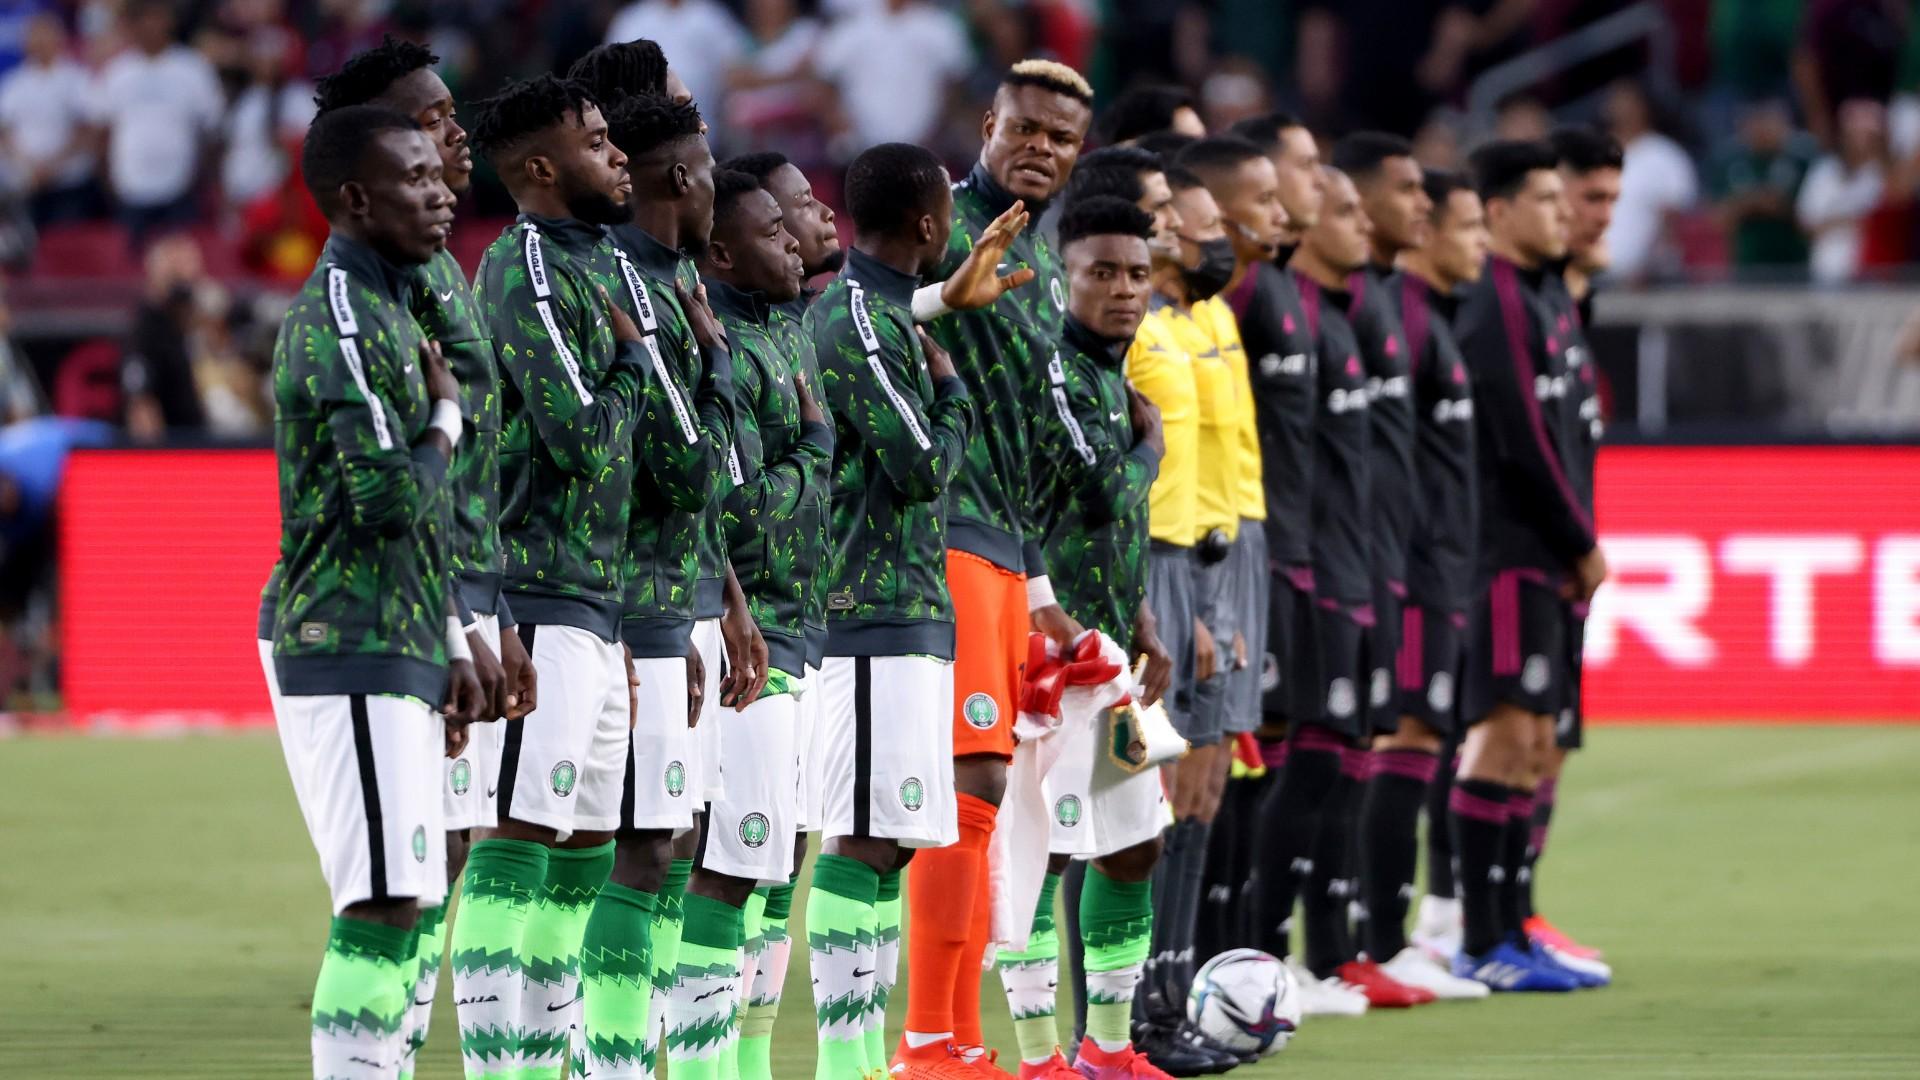 Vindication for Rohr: Nigeria's NPFL players not good enough for Super Eagles - Olatunji-Okuku